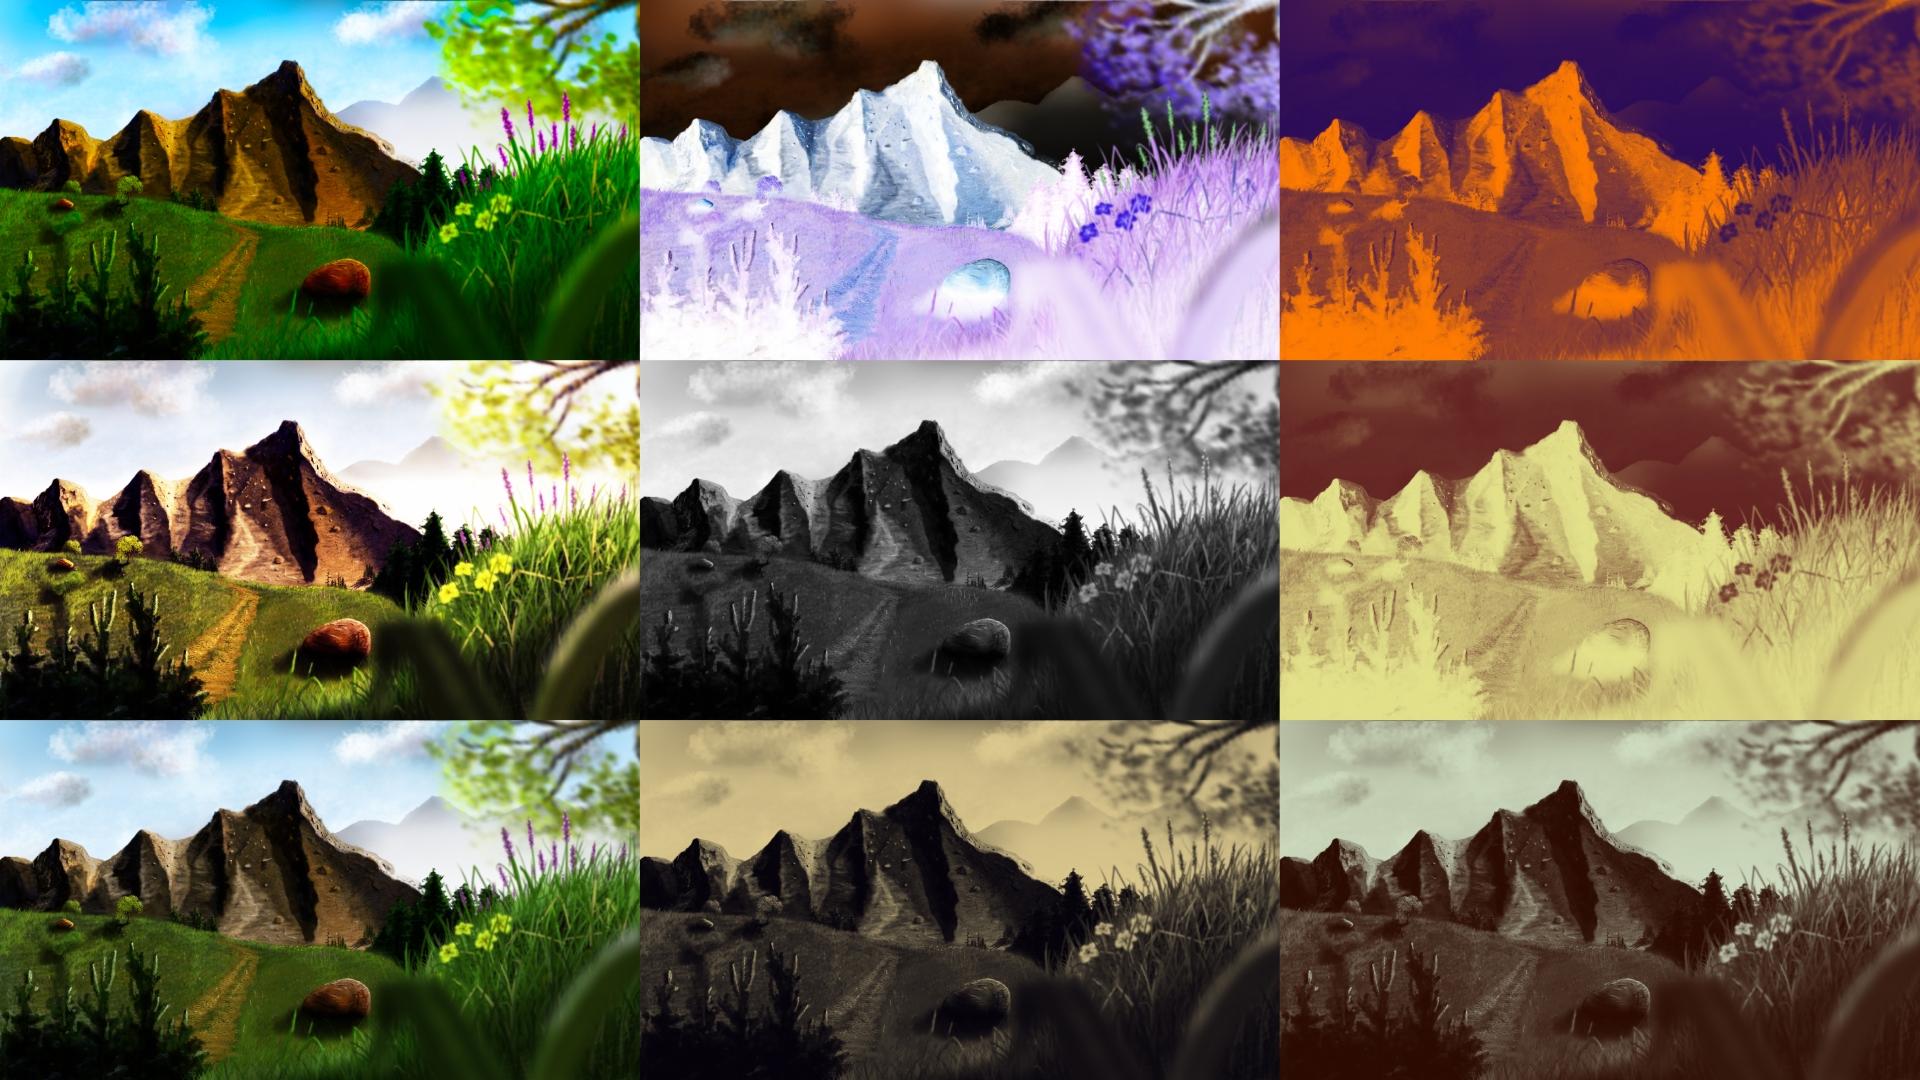 painted mountain wallpaper ispazio - photo #14